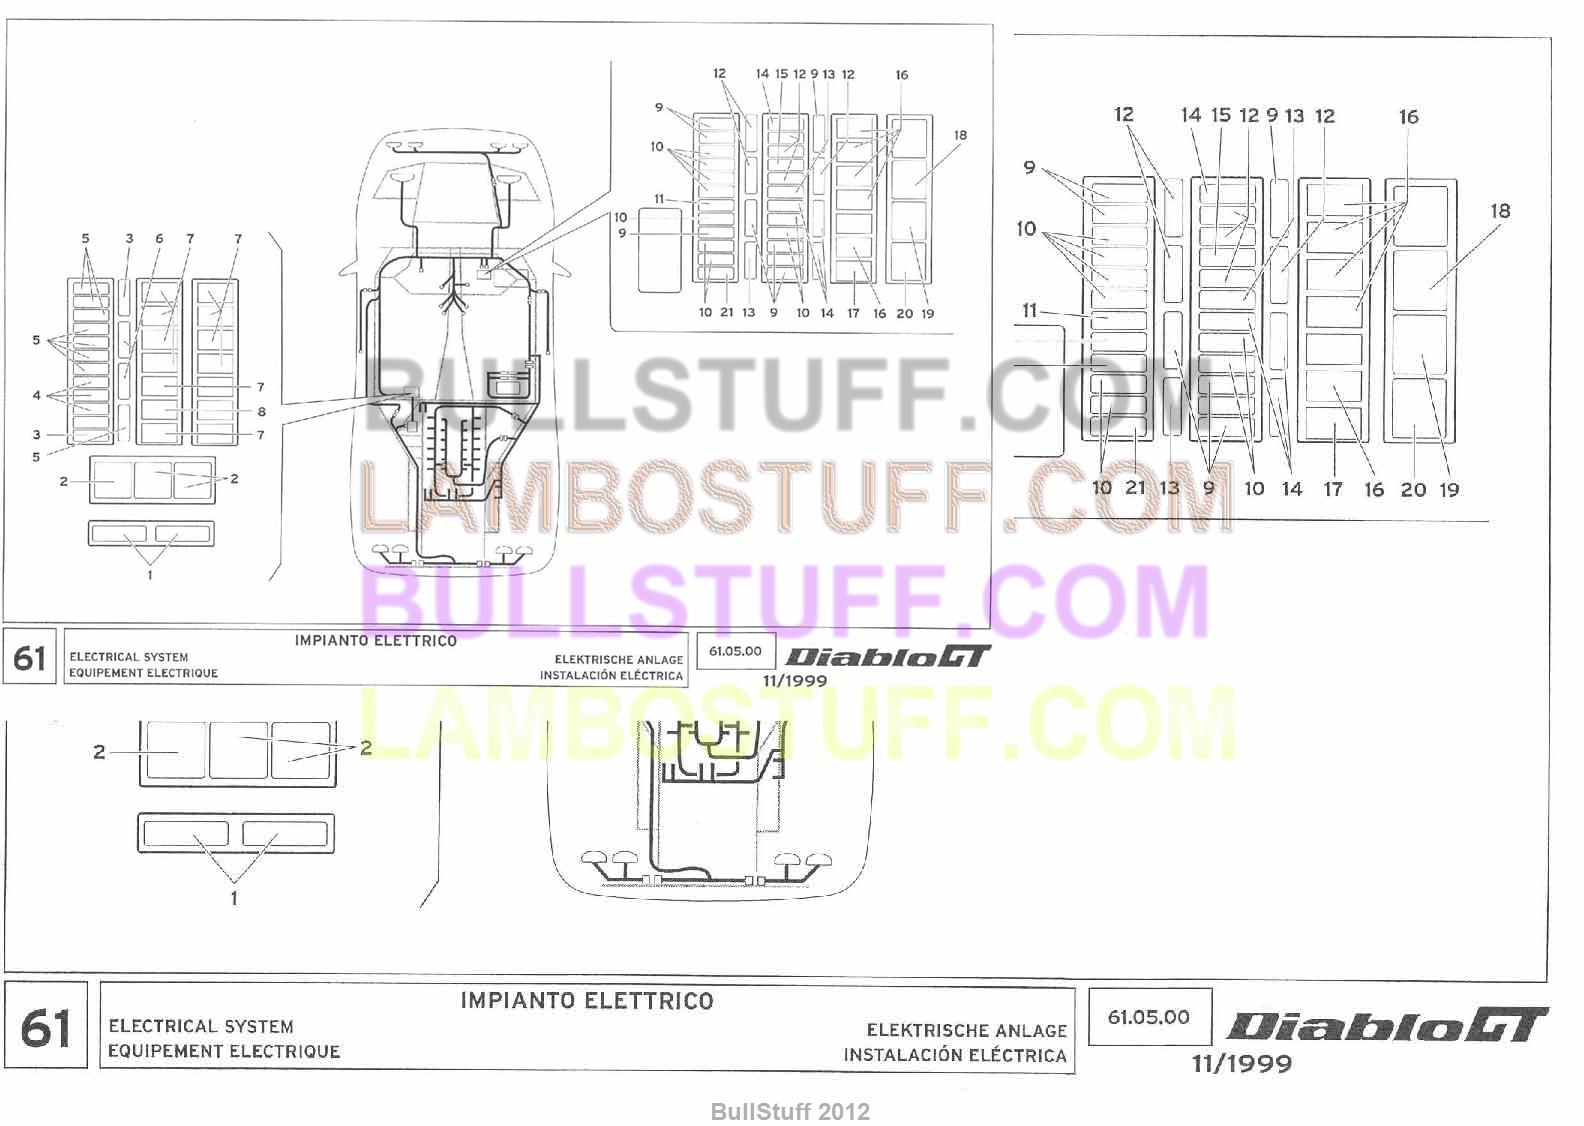 Lamborghini Diablo Wiring Diagram Books Of Motorola Alternator 9db2lj2b58 1999 Gt Usa Electrical System 61 05 00 Rh Bullstuff Com